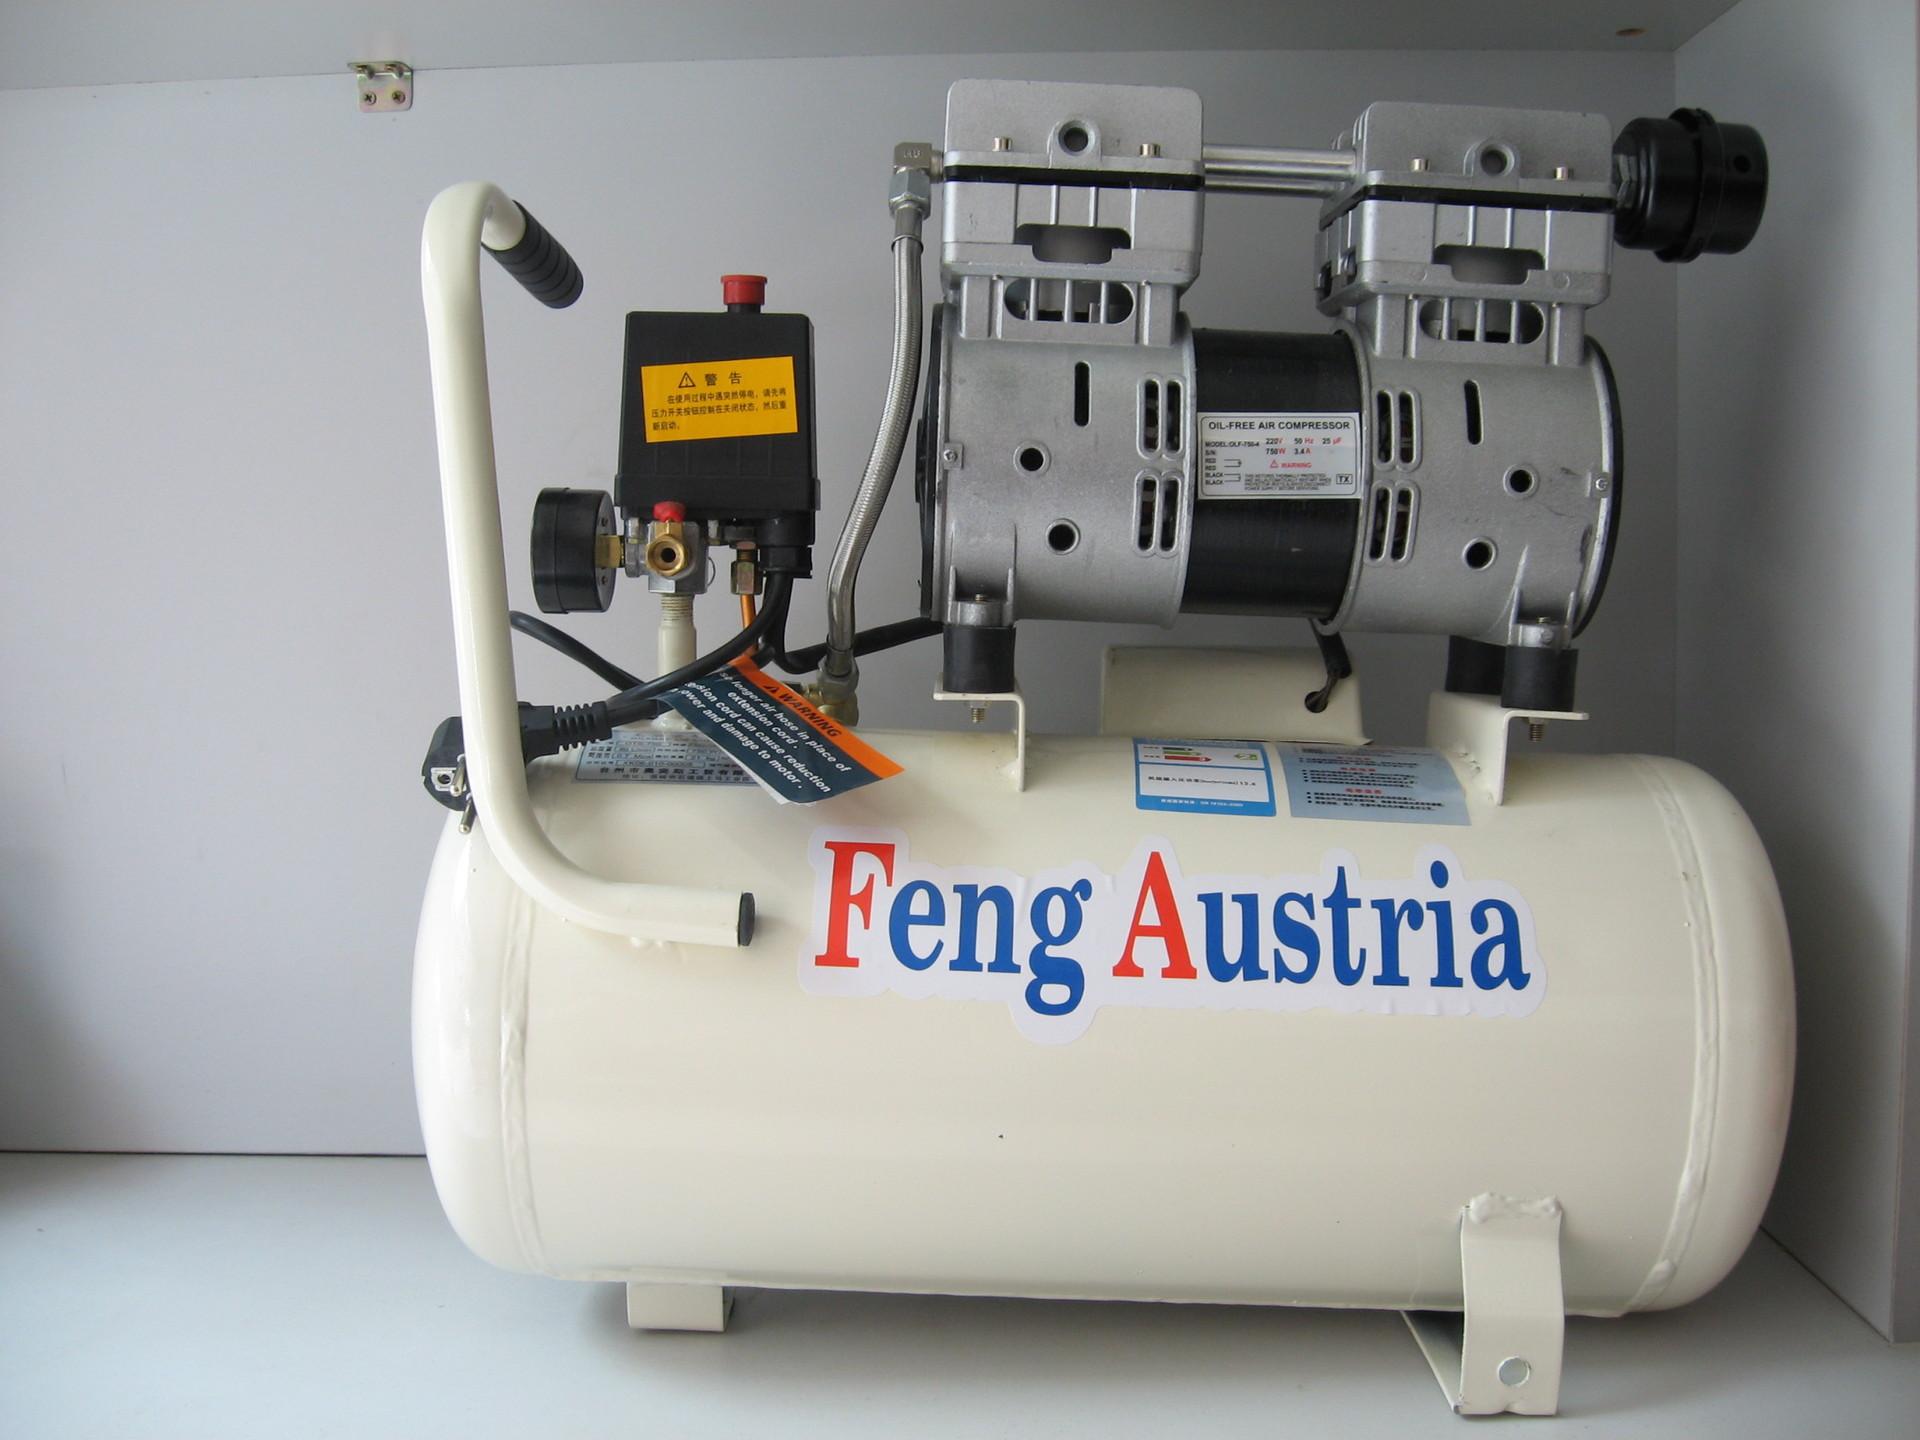 FUCHS Renolin RD32气动工具油|福斯RD(32-320)工具油 产品编号:422 RENOLIN RD油品推荐用于润滑所有类型的航空公司 气动设备。油粘合剂的性质和 用优异的薄膜强度和润滑特性。他们表现出 良好的金属润湿特性。 额外的质量特点 尽量减少沉积物的形成。 非危险的,无毒的,没有不愉快的气味。 出色的防腐蚀保护。 公司名称:深圳市华驰润滑油有限公司 网络营销部: 李先生 如需下单或咨询可致电:0755-29055799 手机:13006639898李先生 传真:0755-2905